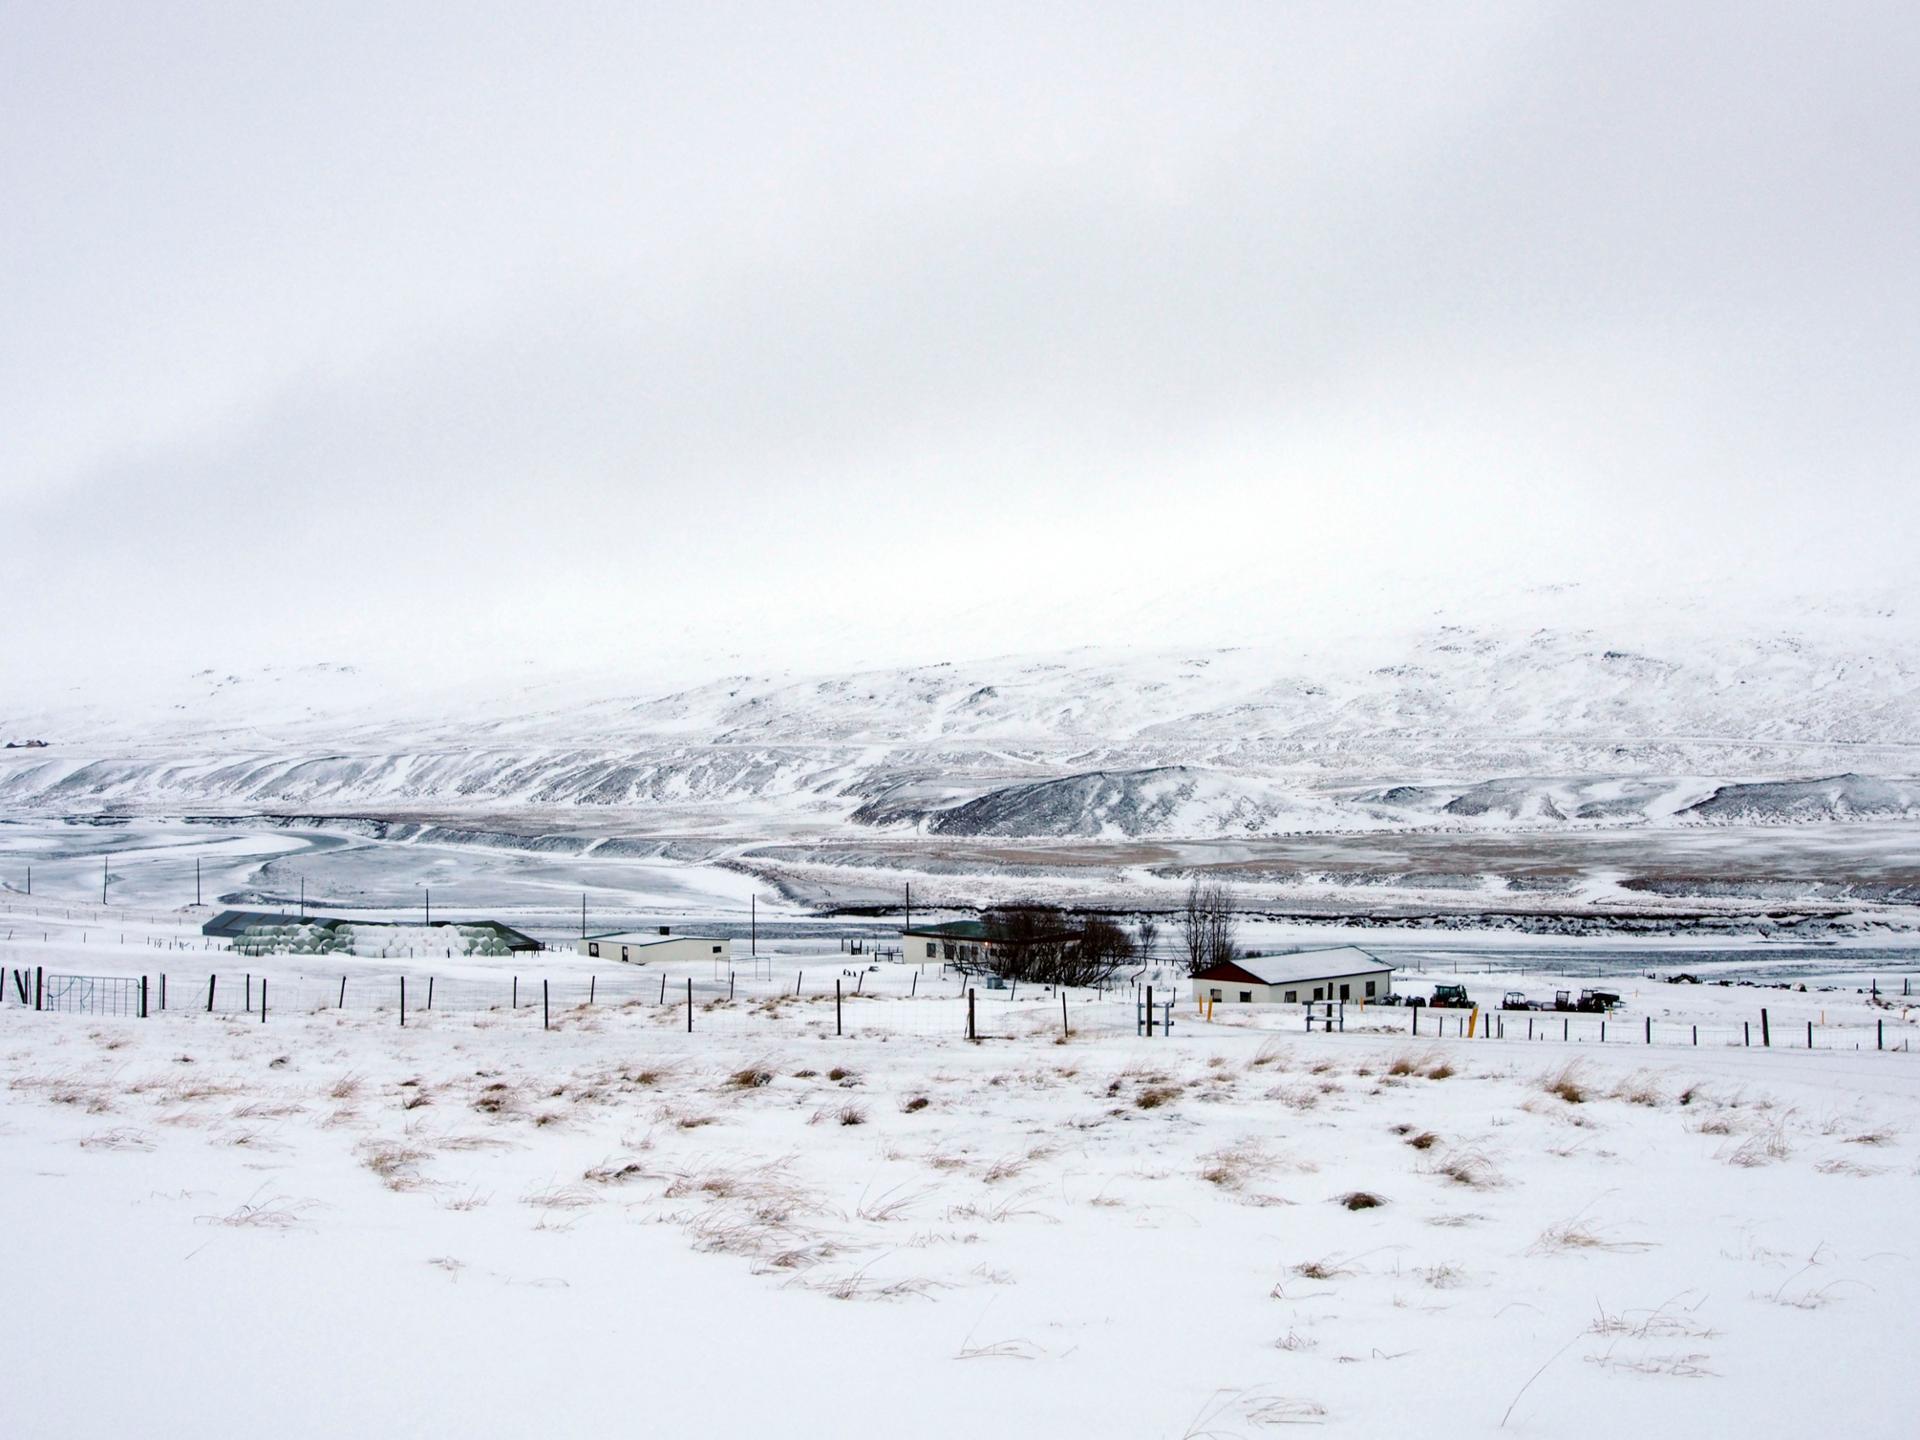 Lava & Snow - East Iceland 2014